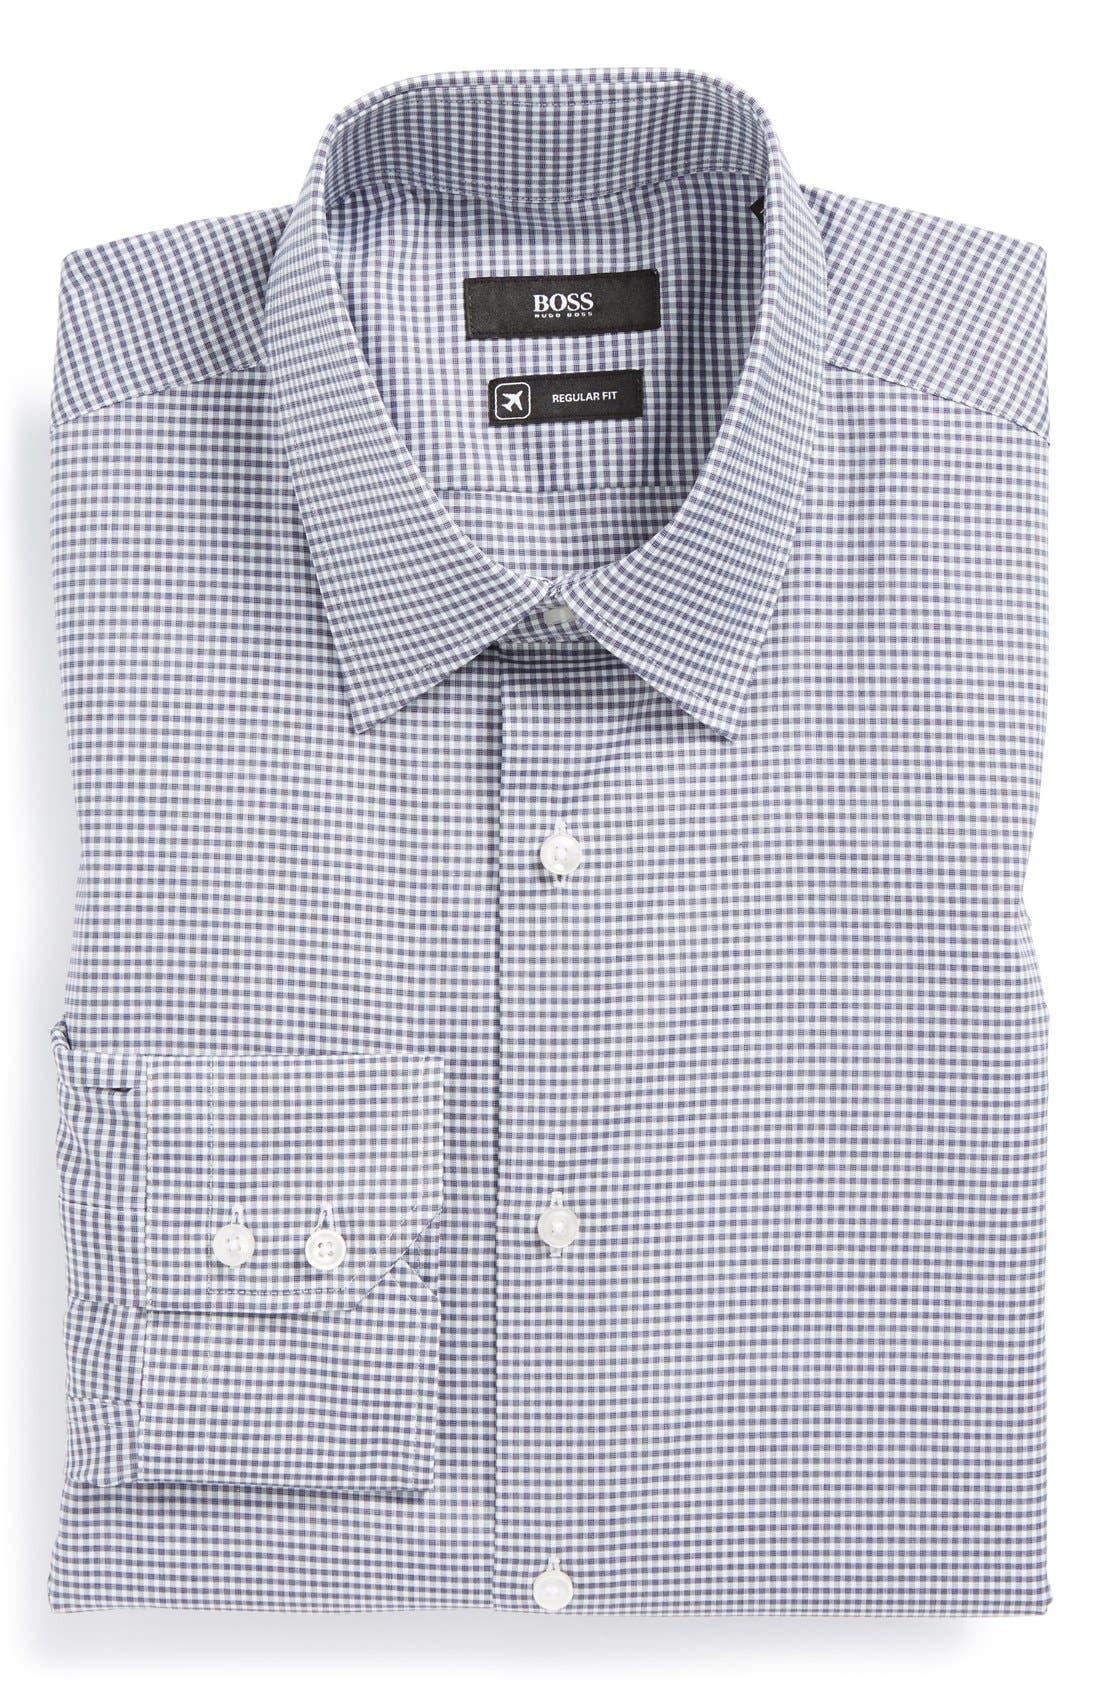 Alternate Image 1 Selected - BOSS HUGO BOSS 'Enzo WW' Regular Fit Travel Dress Shirt